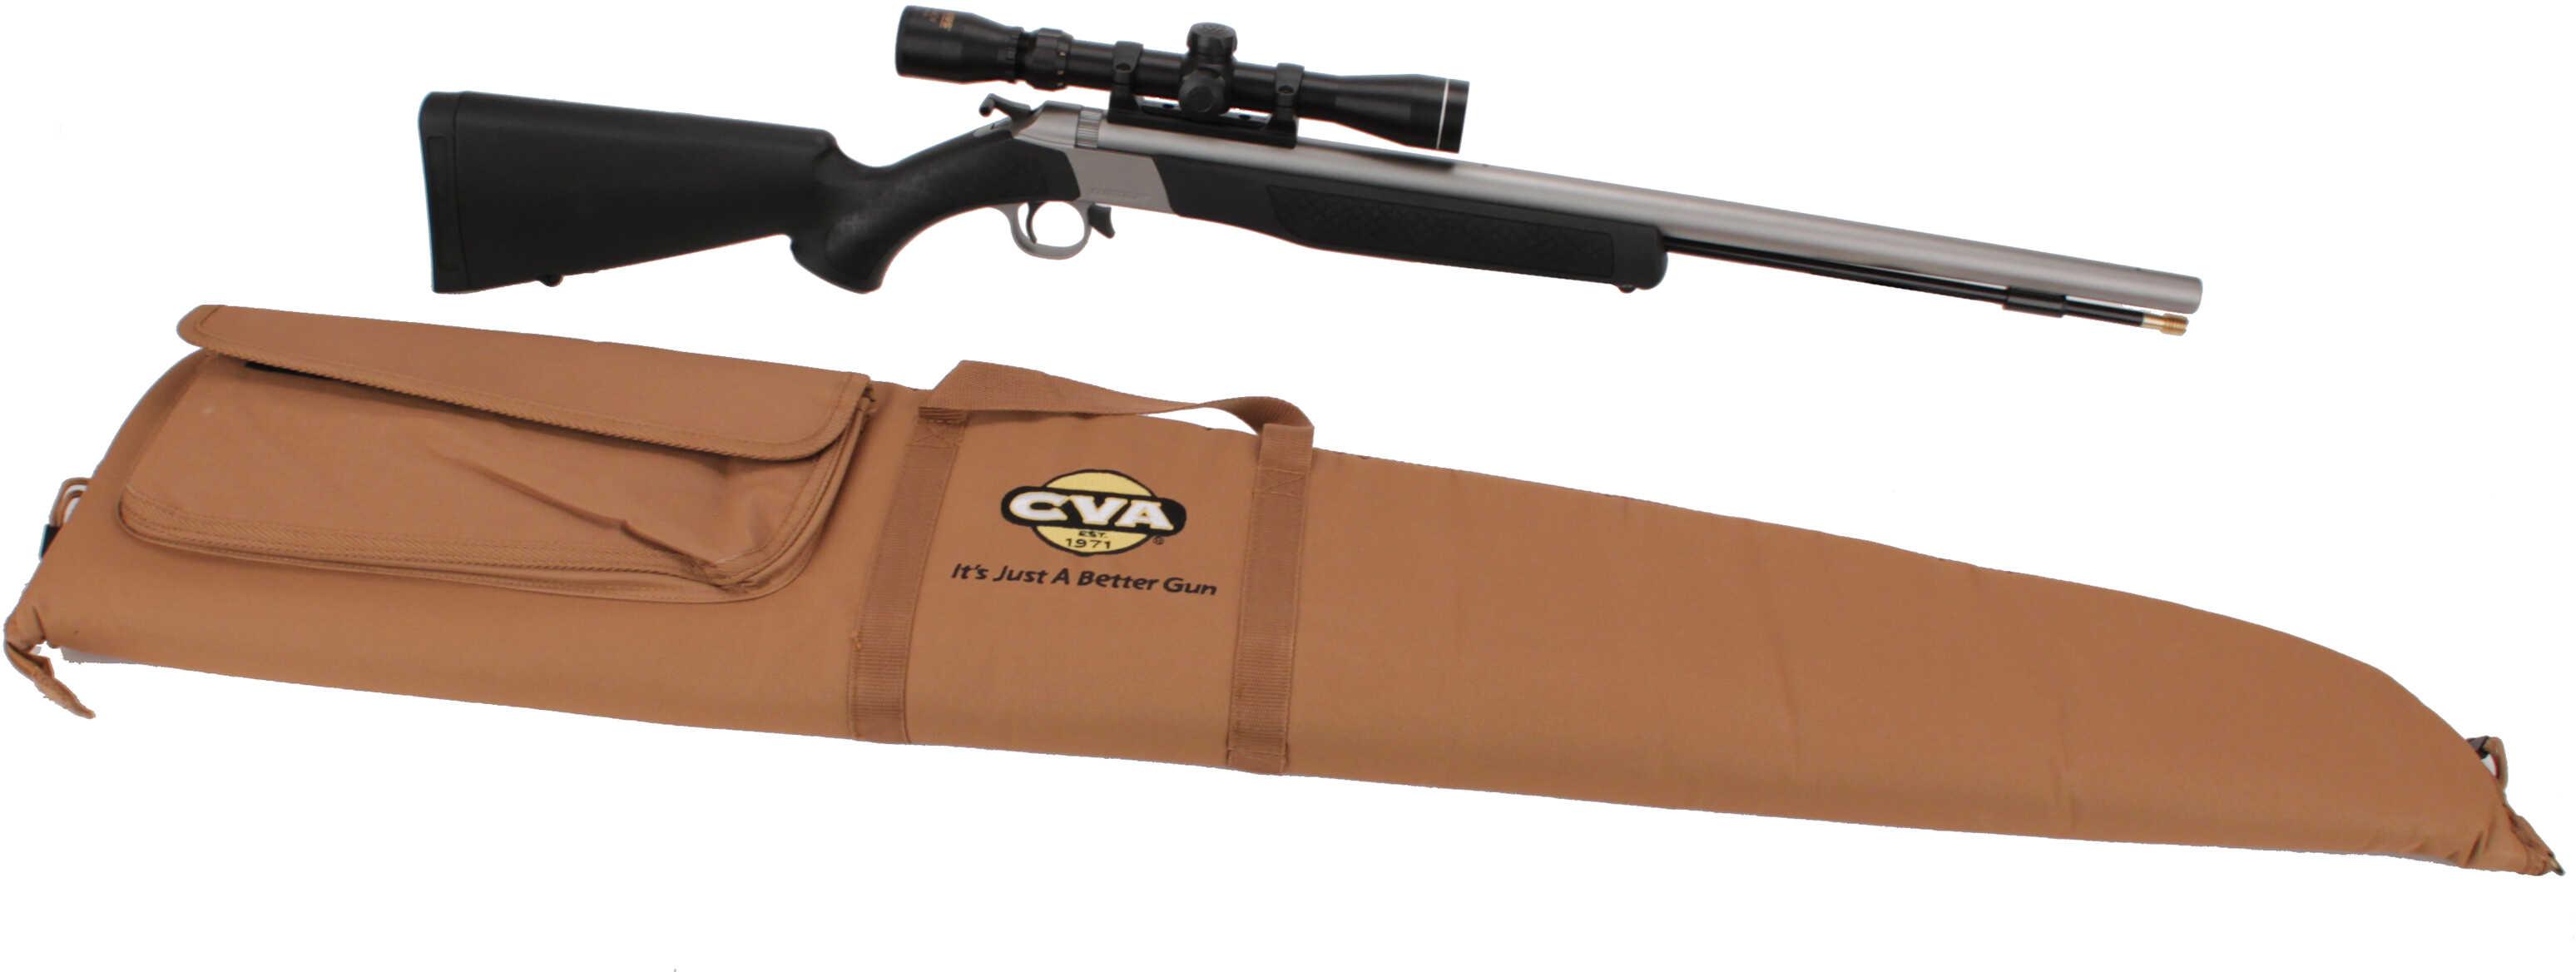 CVA Wolf .50 Caliber Muzzleloader Stainless Steel/Black w/KonuShot Scope PR2110SSC